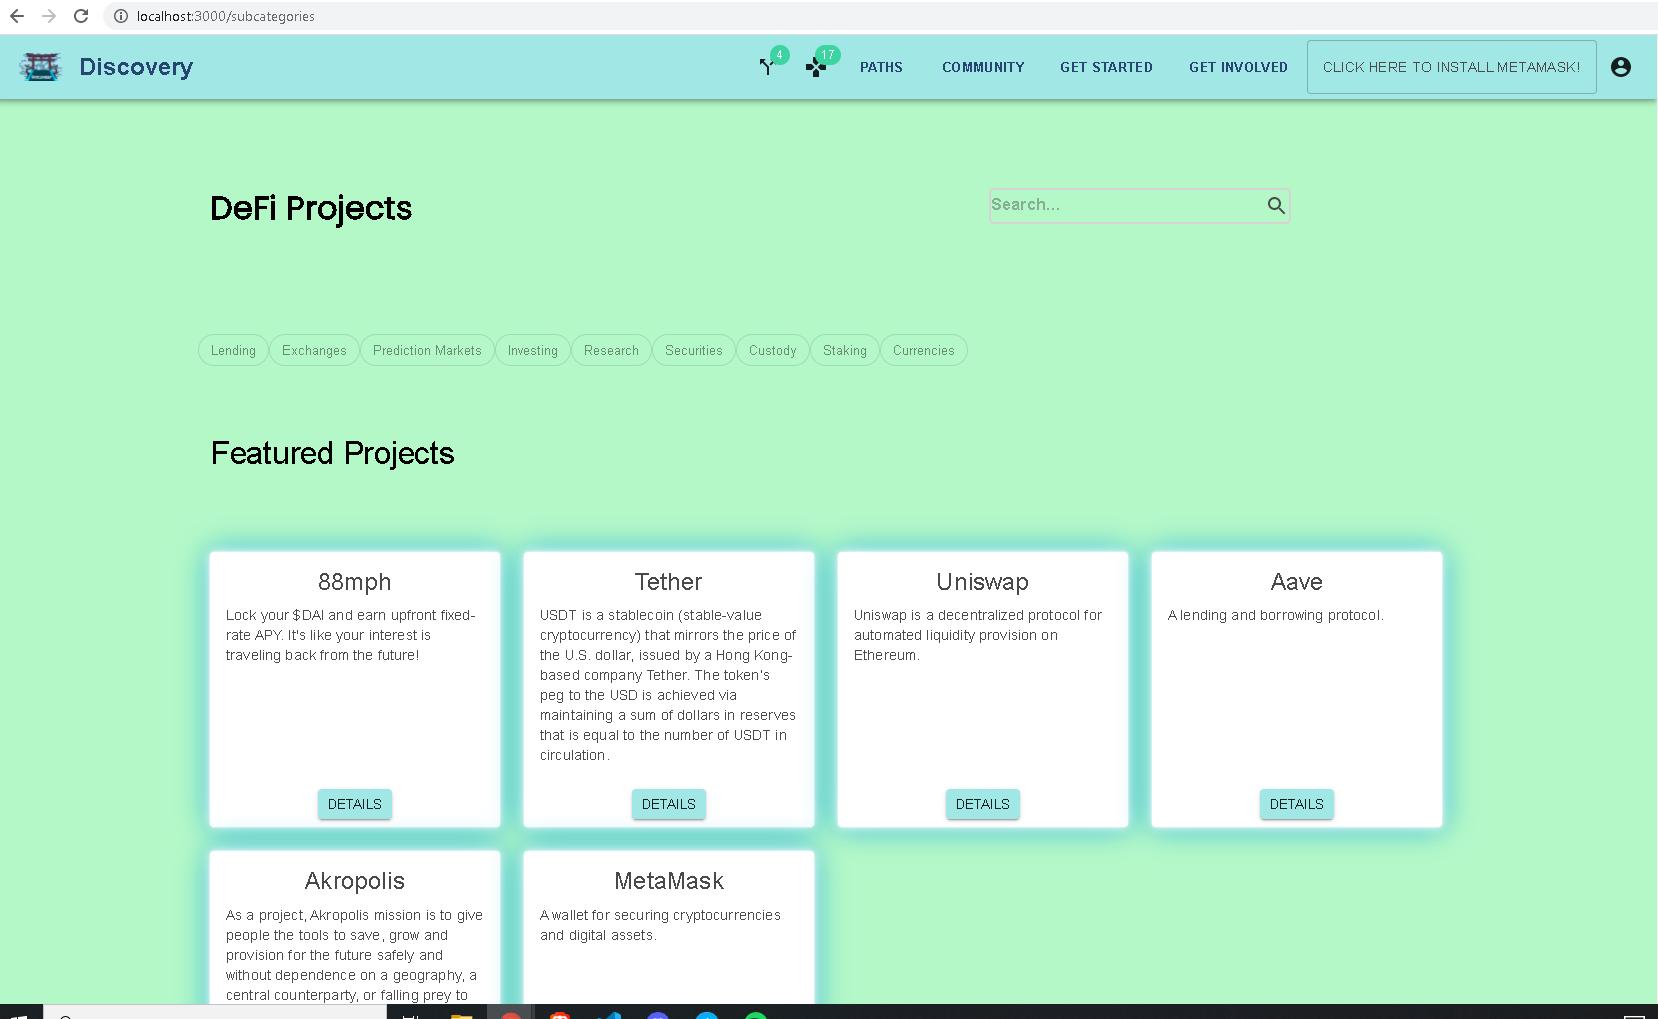 https://ethglobal.s3.amazonaws.com/recFxn74BbzqRF8U8/featured-projects.png